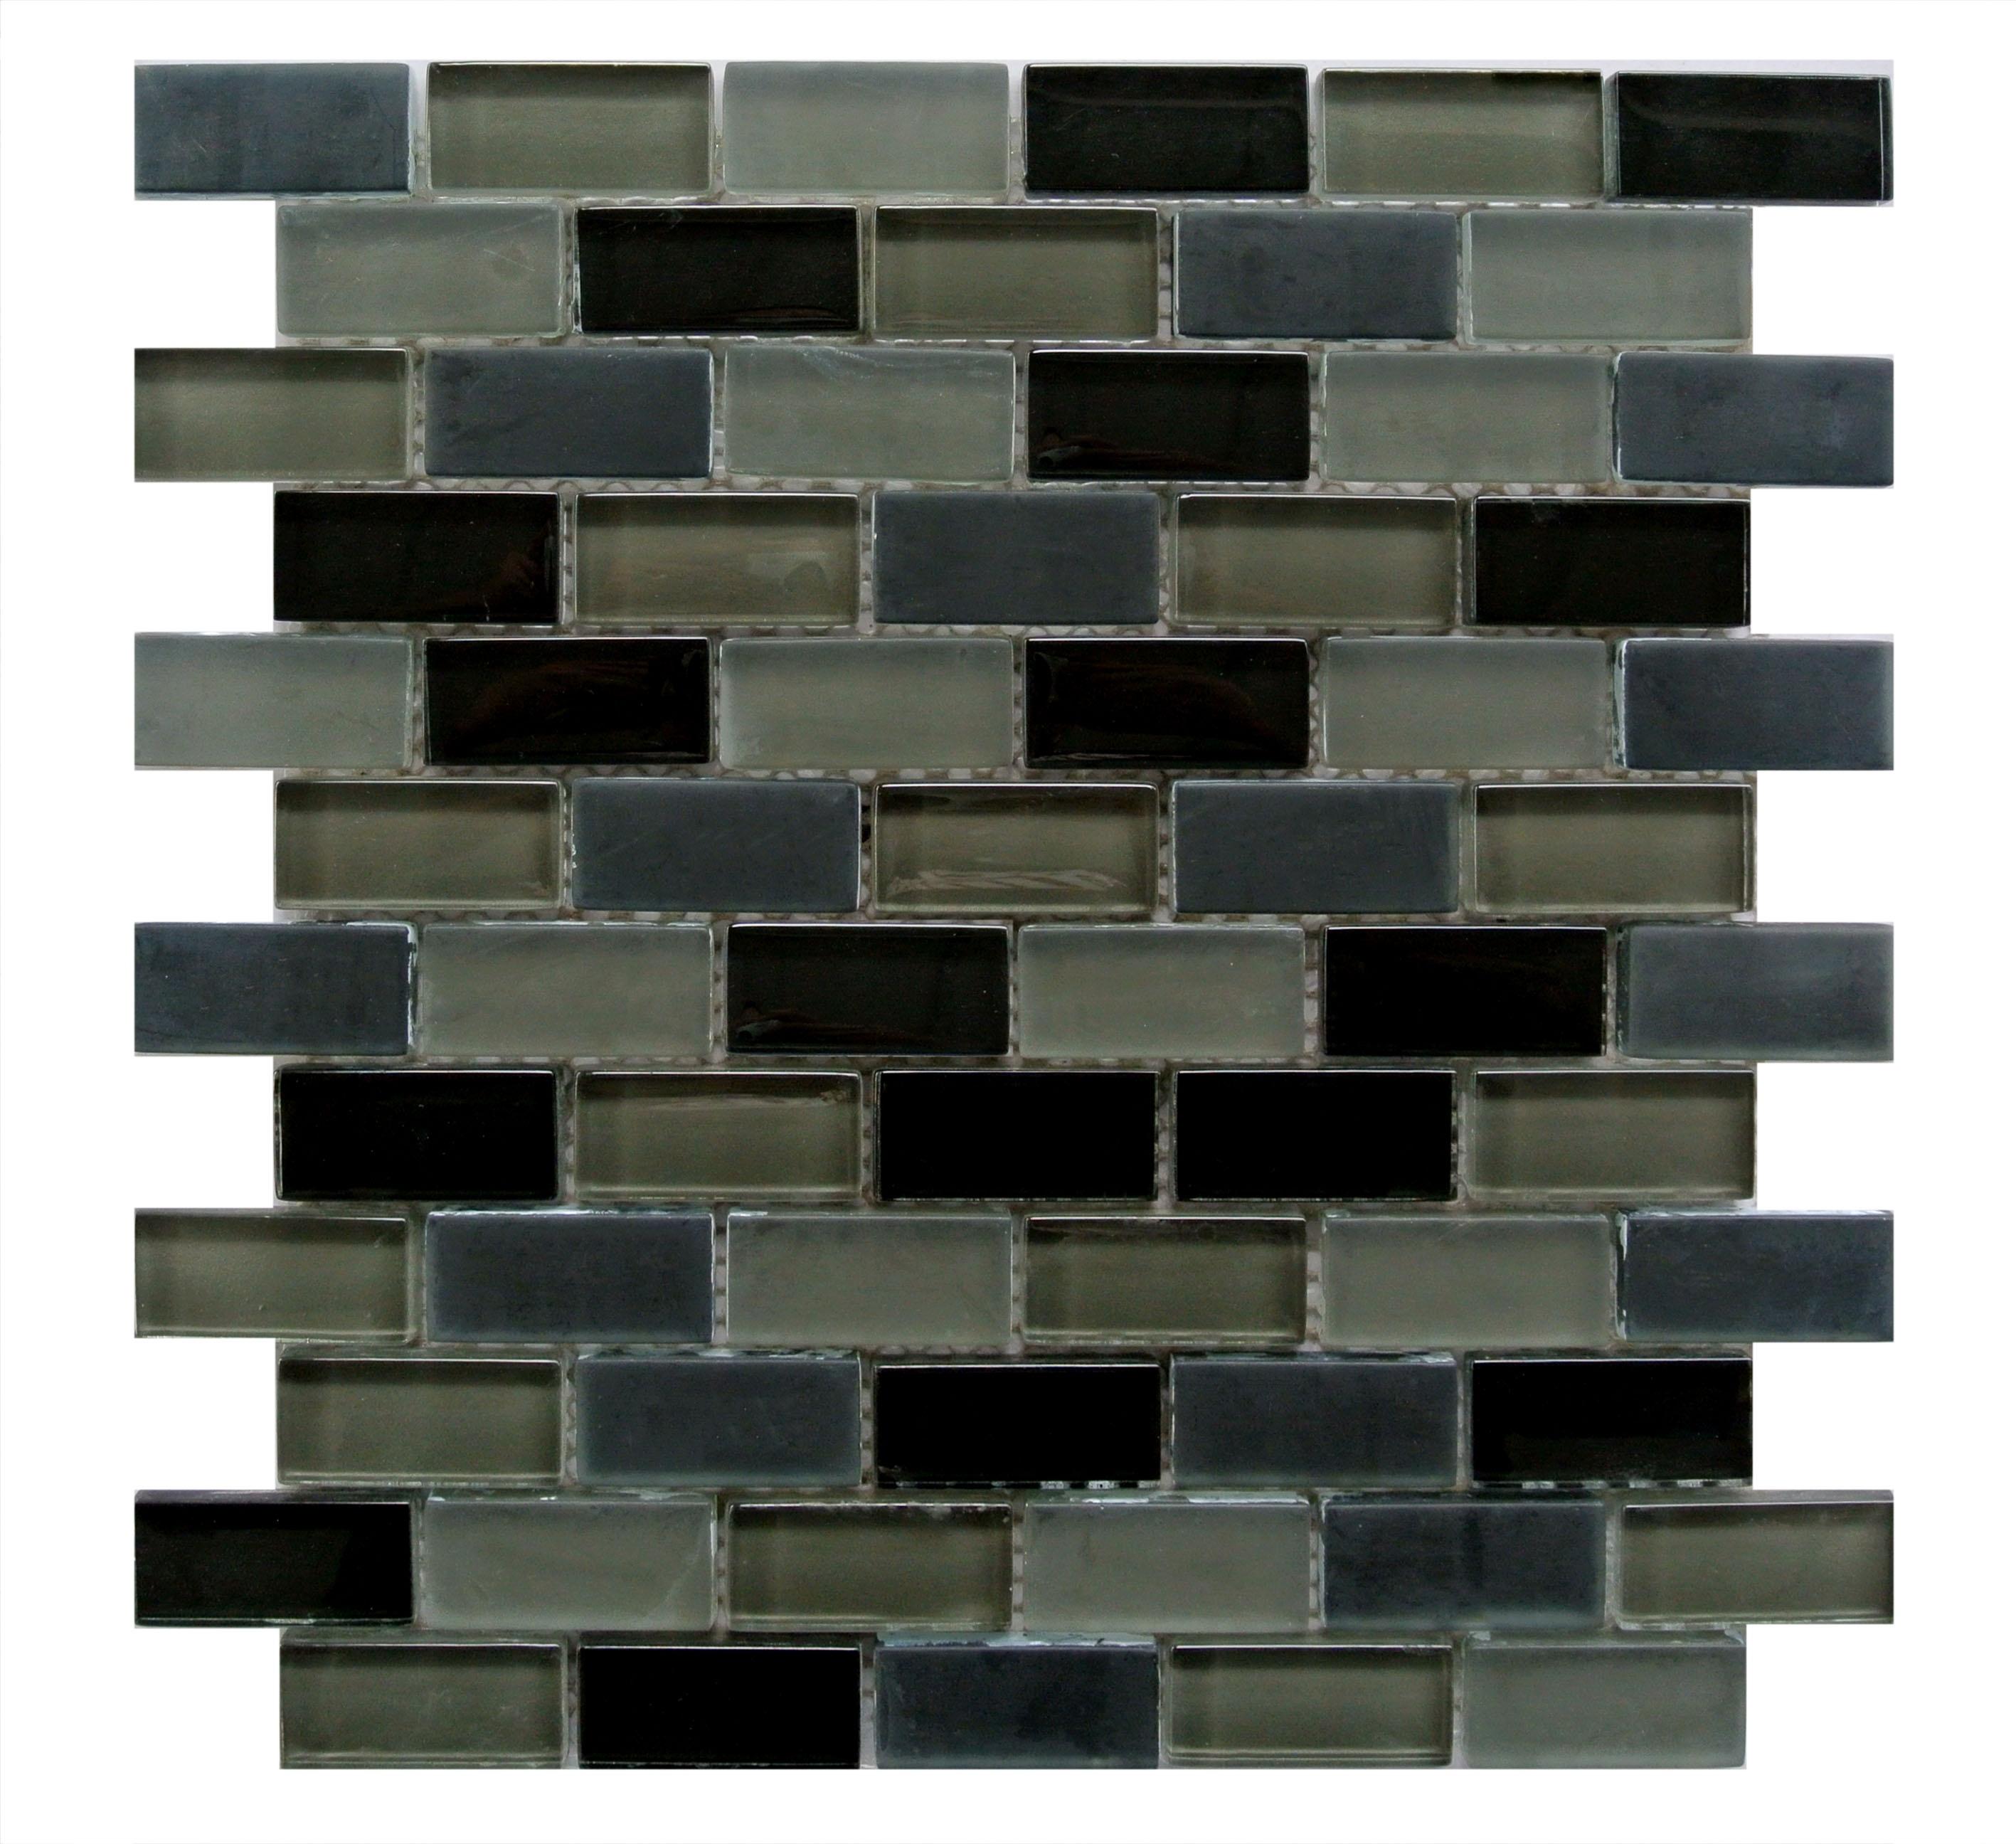 "Free Flow 1"" x 2"" Multi Finish Black Glass Brick Backsplash Mosaic Wall & Floor Tile"